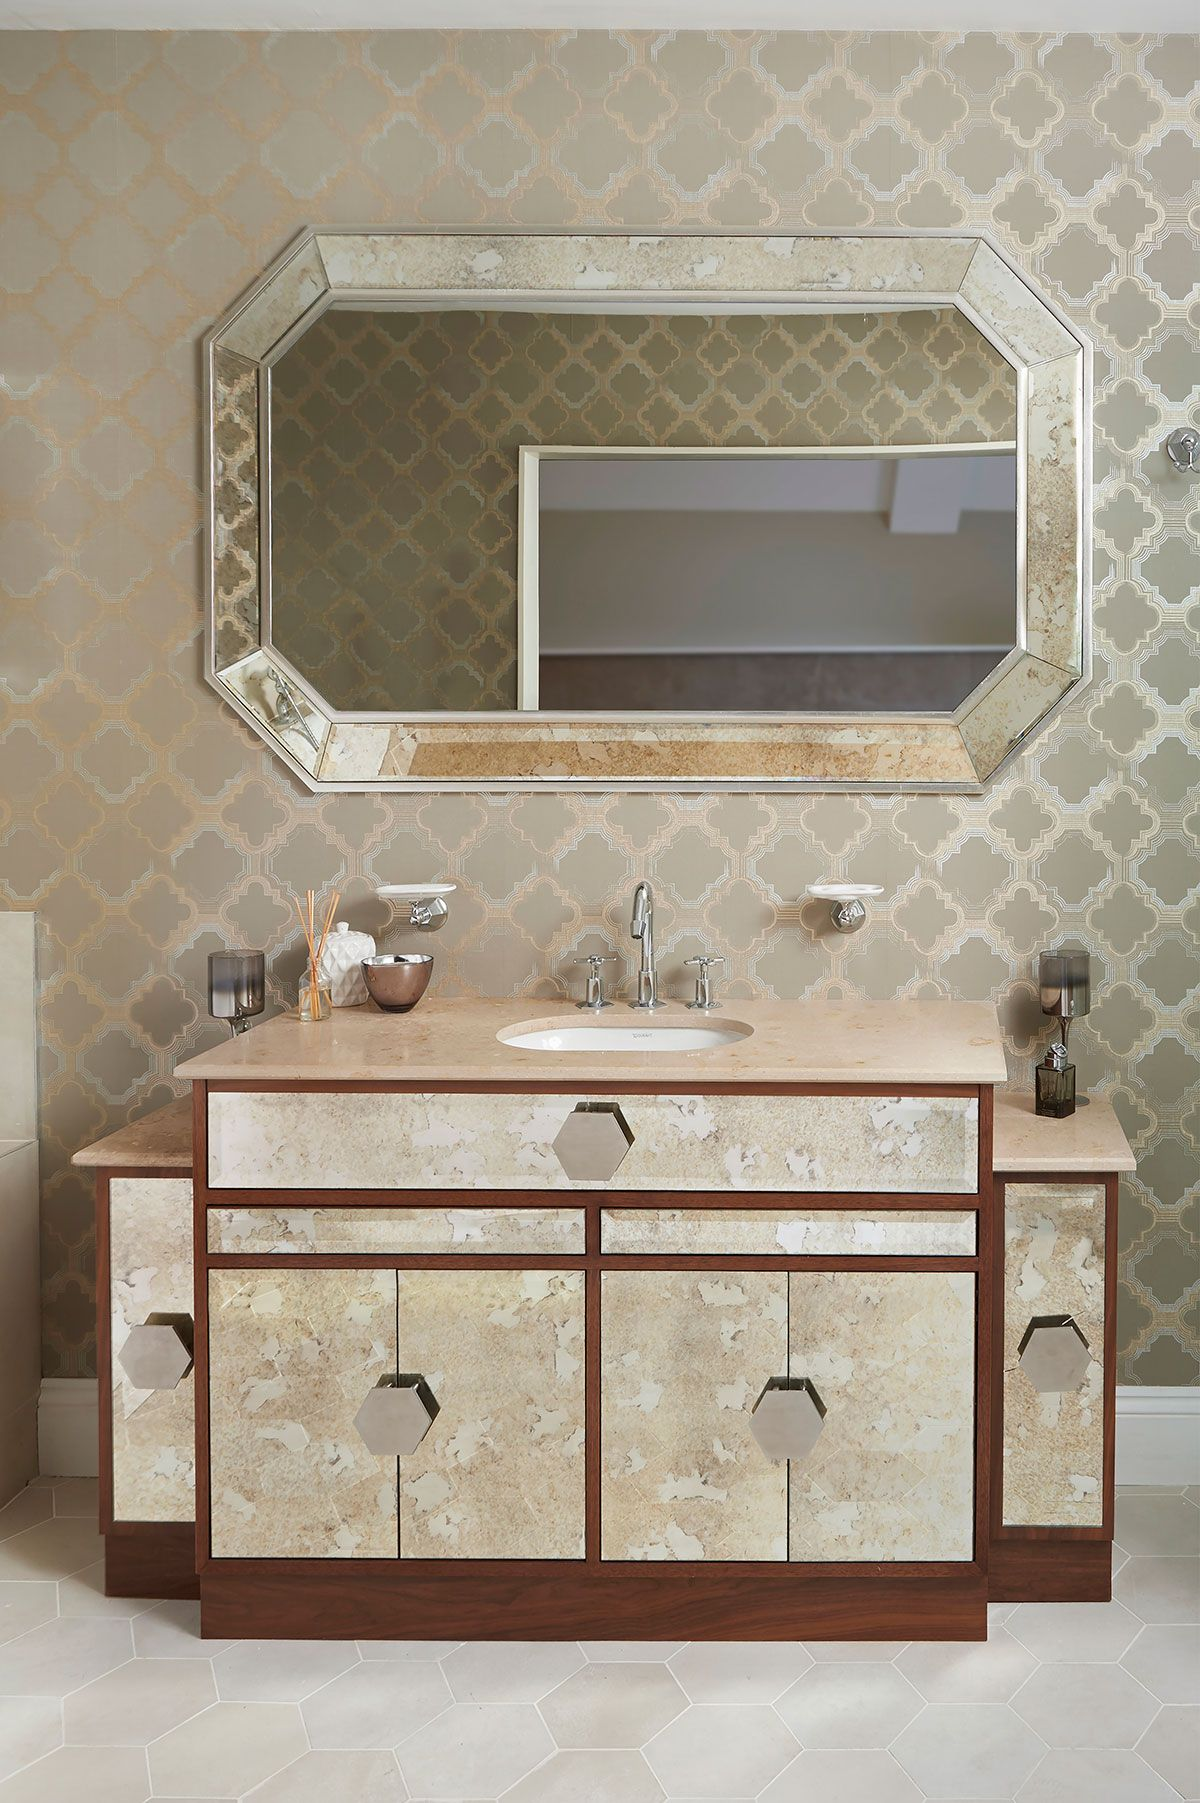 Justin Van Breda Collaborates With CP Hart CP Hart Waterloo - Bathrooms waterloo